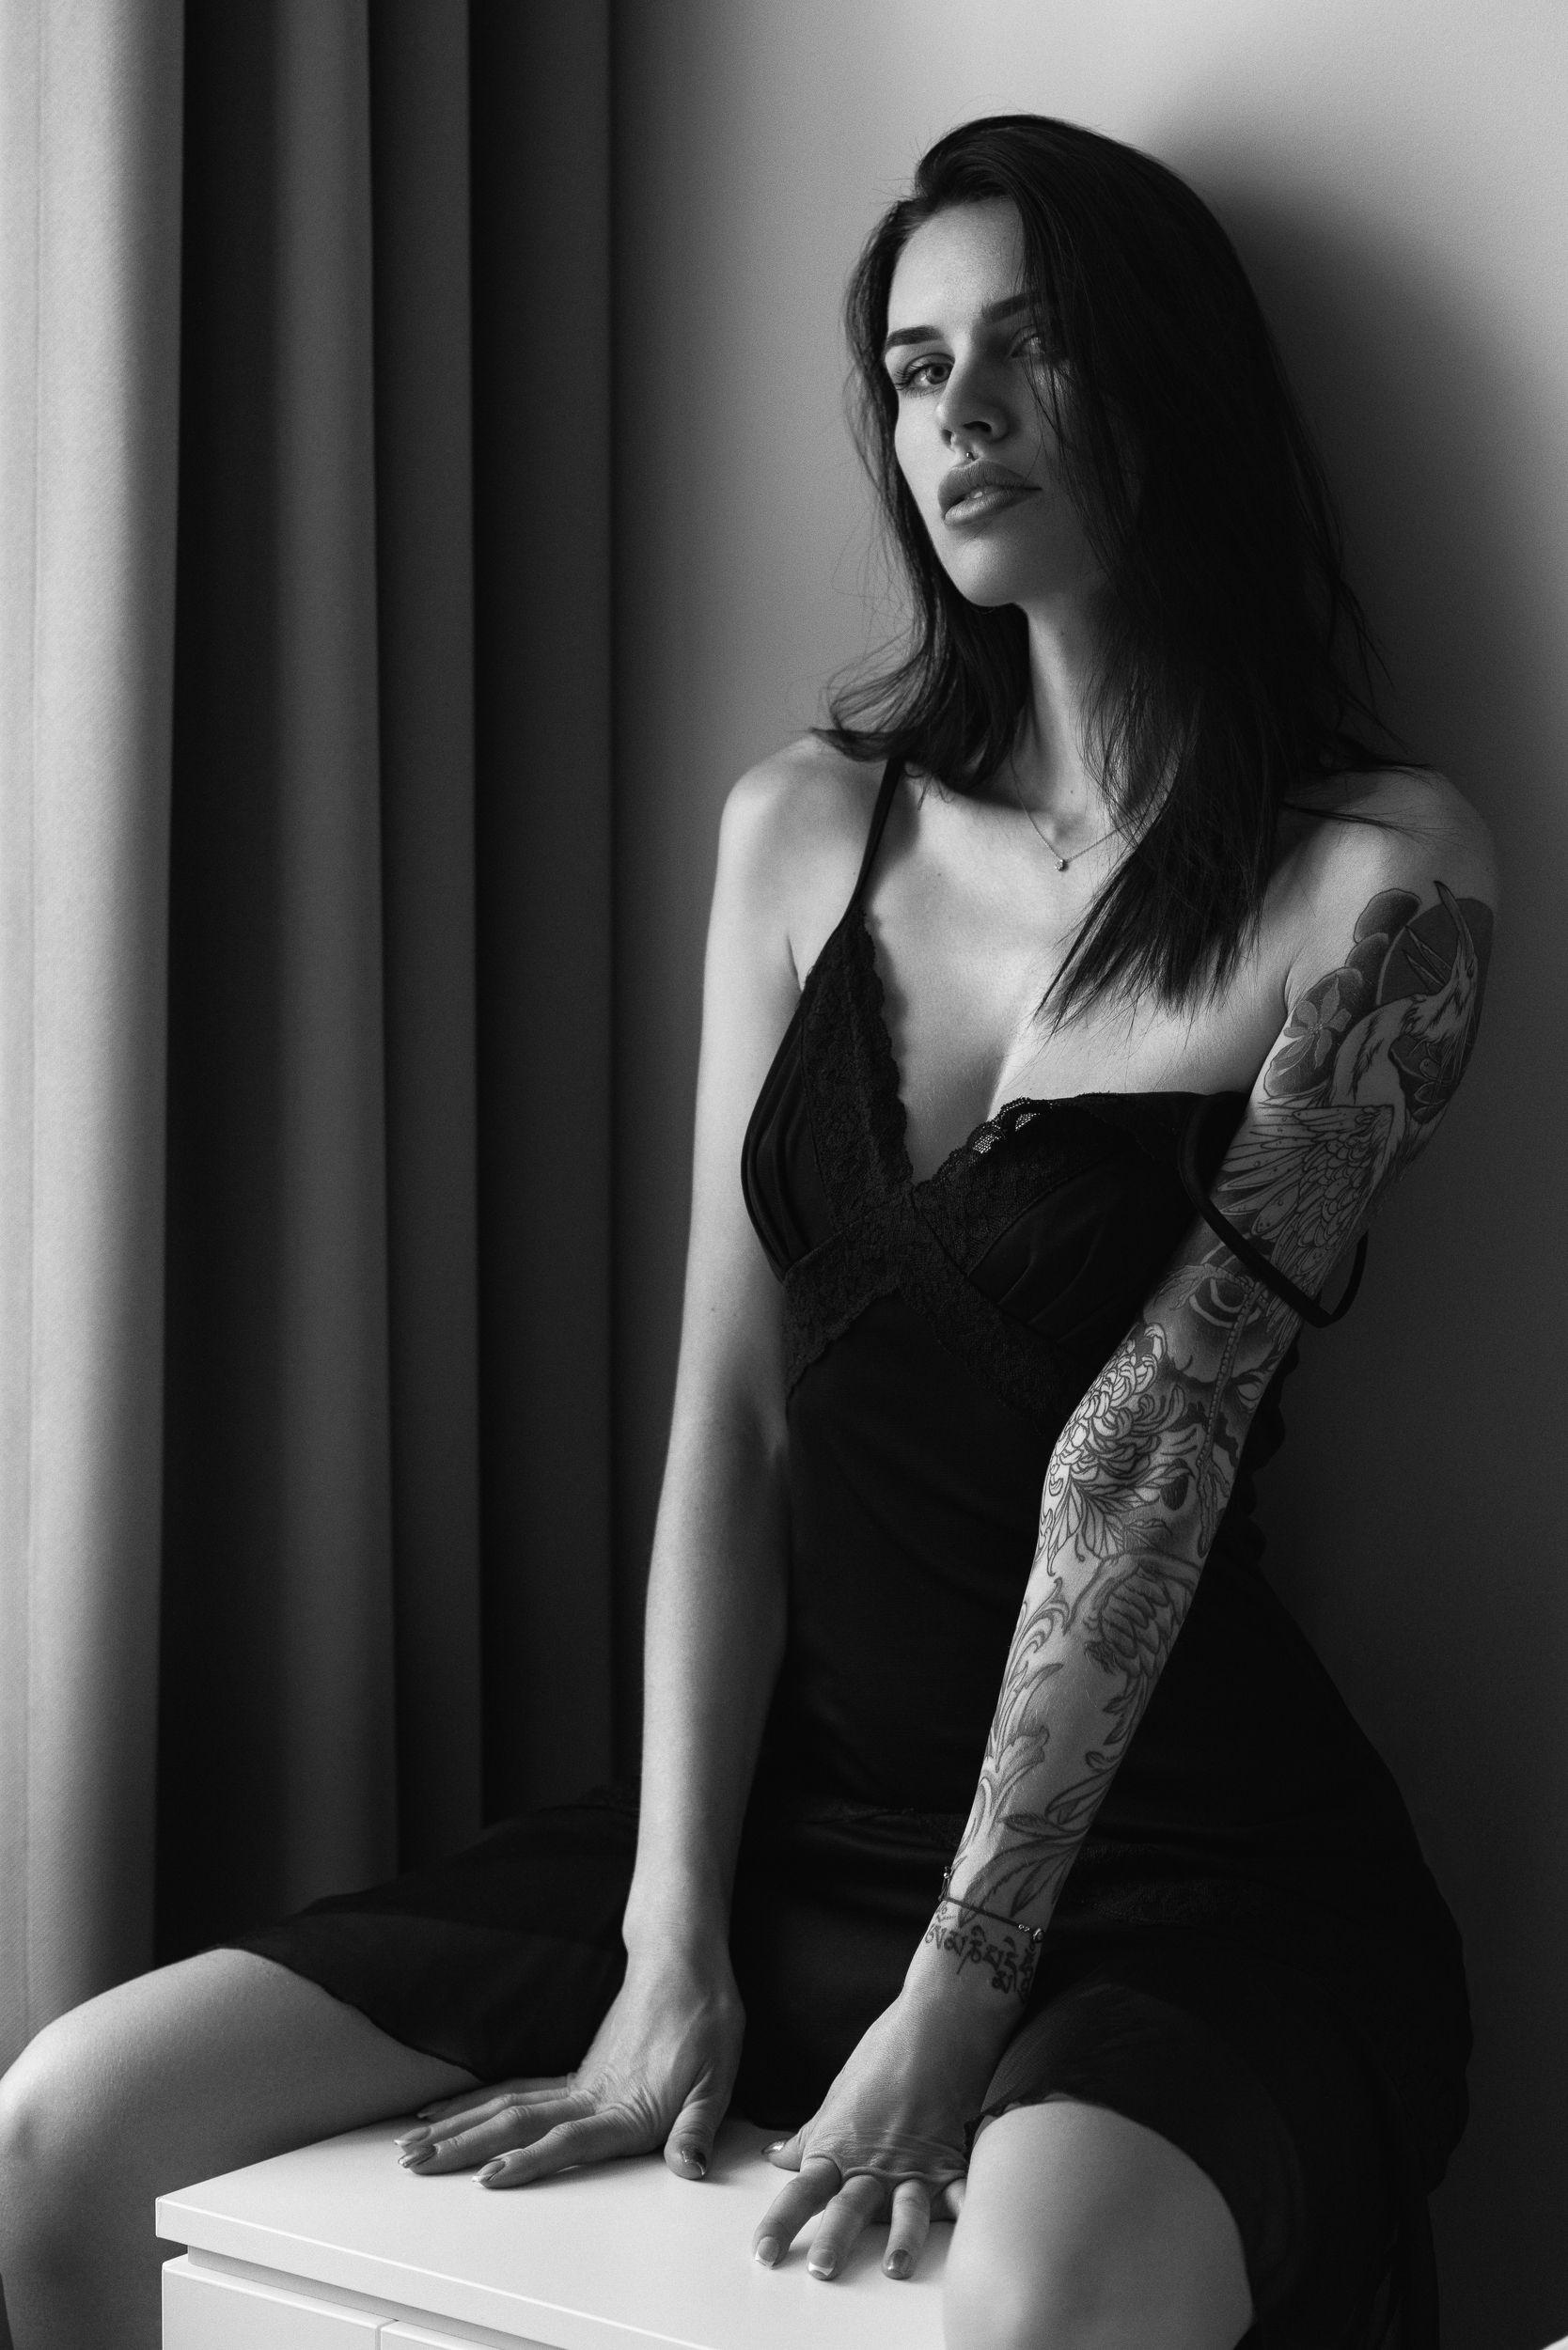 portrait, bw, black and white, monochrome, indoor, woman, tones, sensual, tattoo, beauty, people, Masoit Tomas